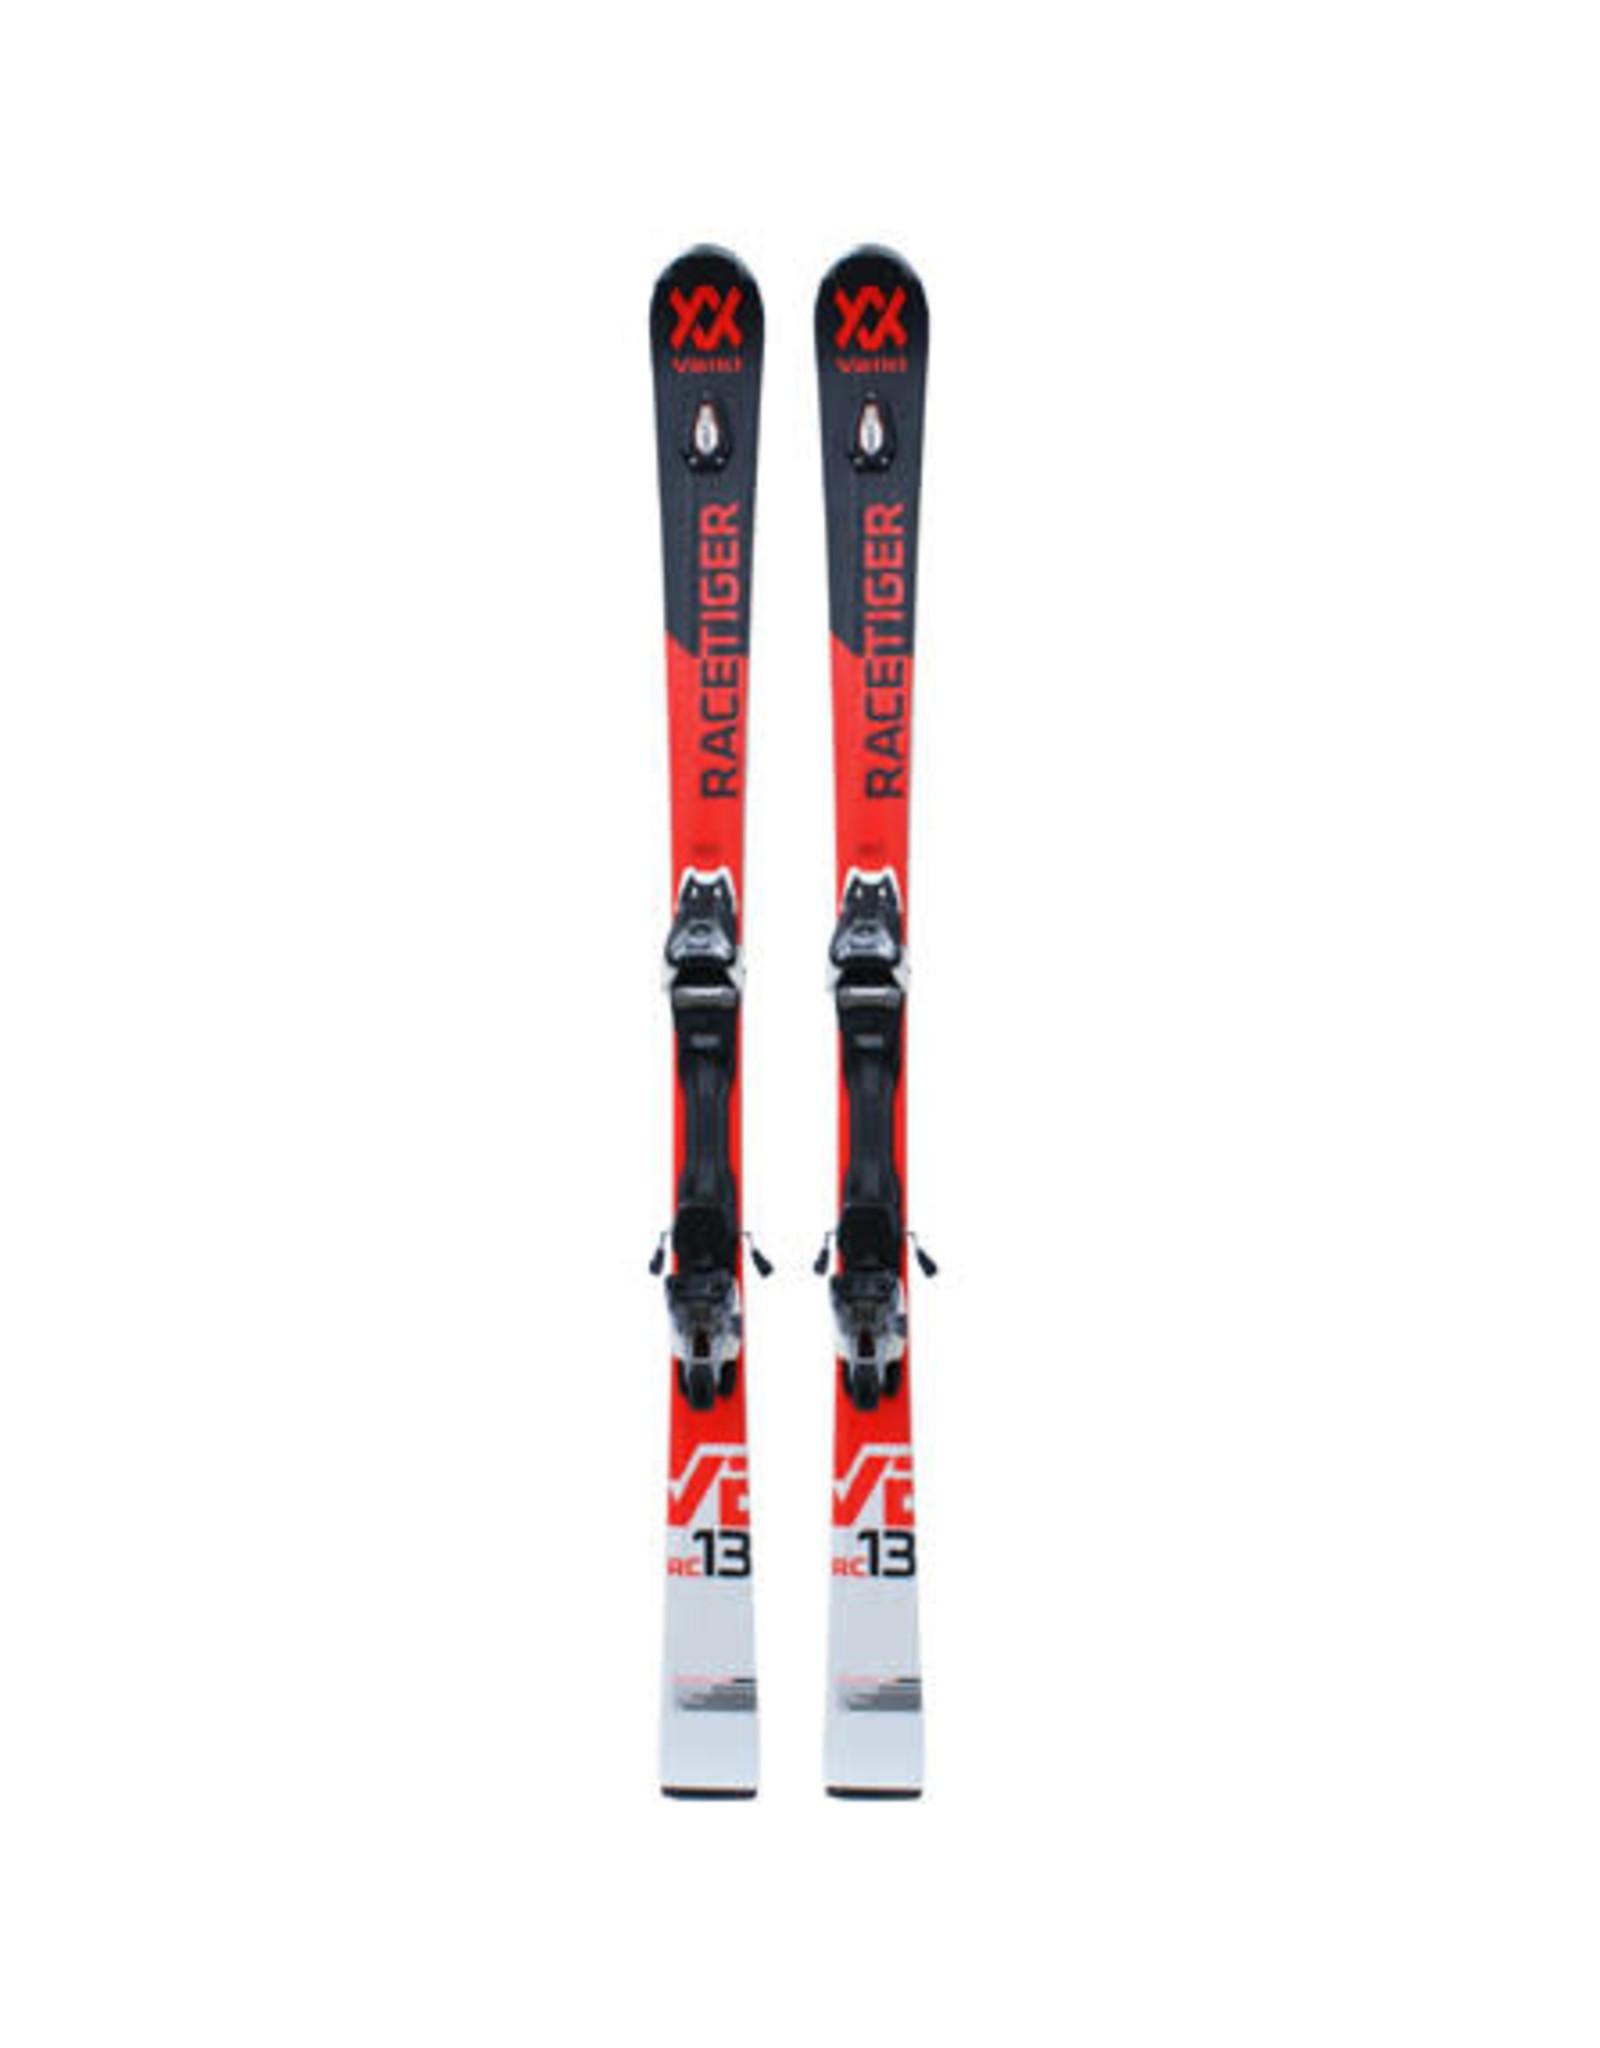 VOLKL Volkl Racetiger RC UVO (v2) Wit/rood/zw Ski's Gebruikt